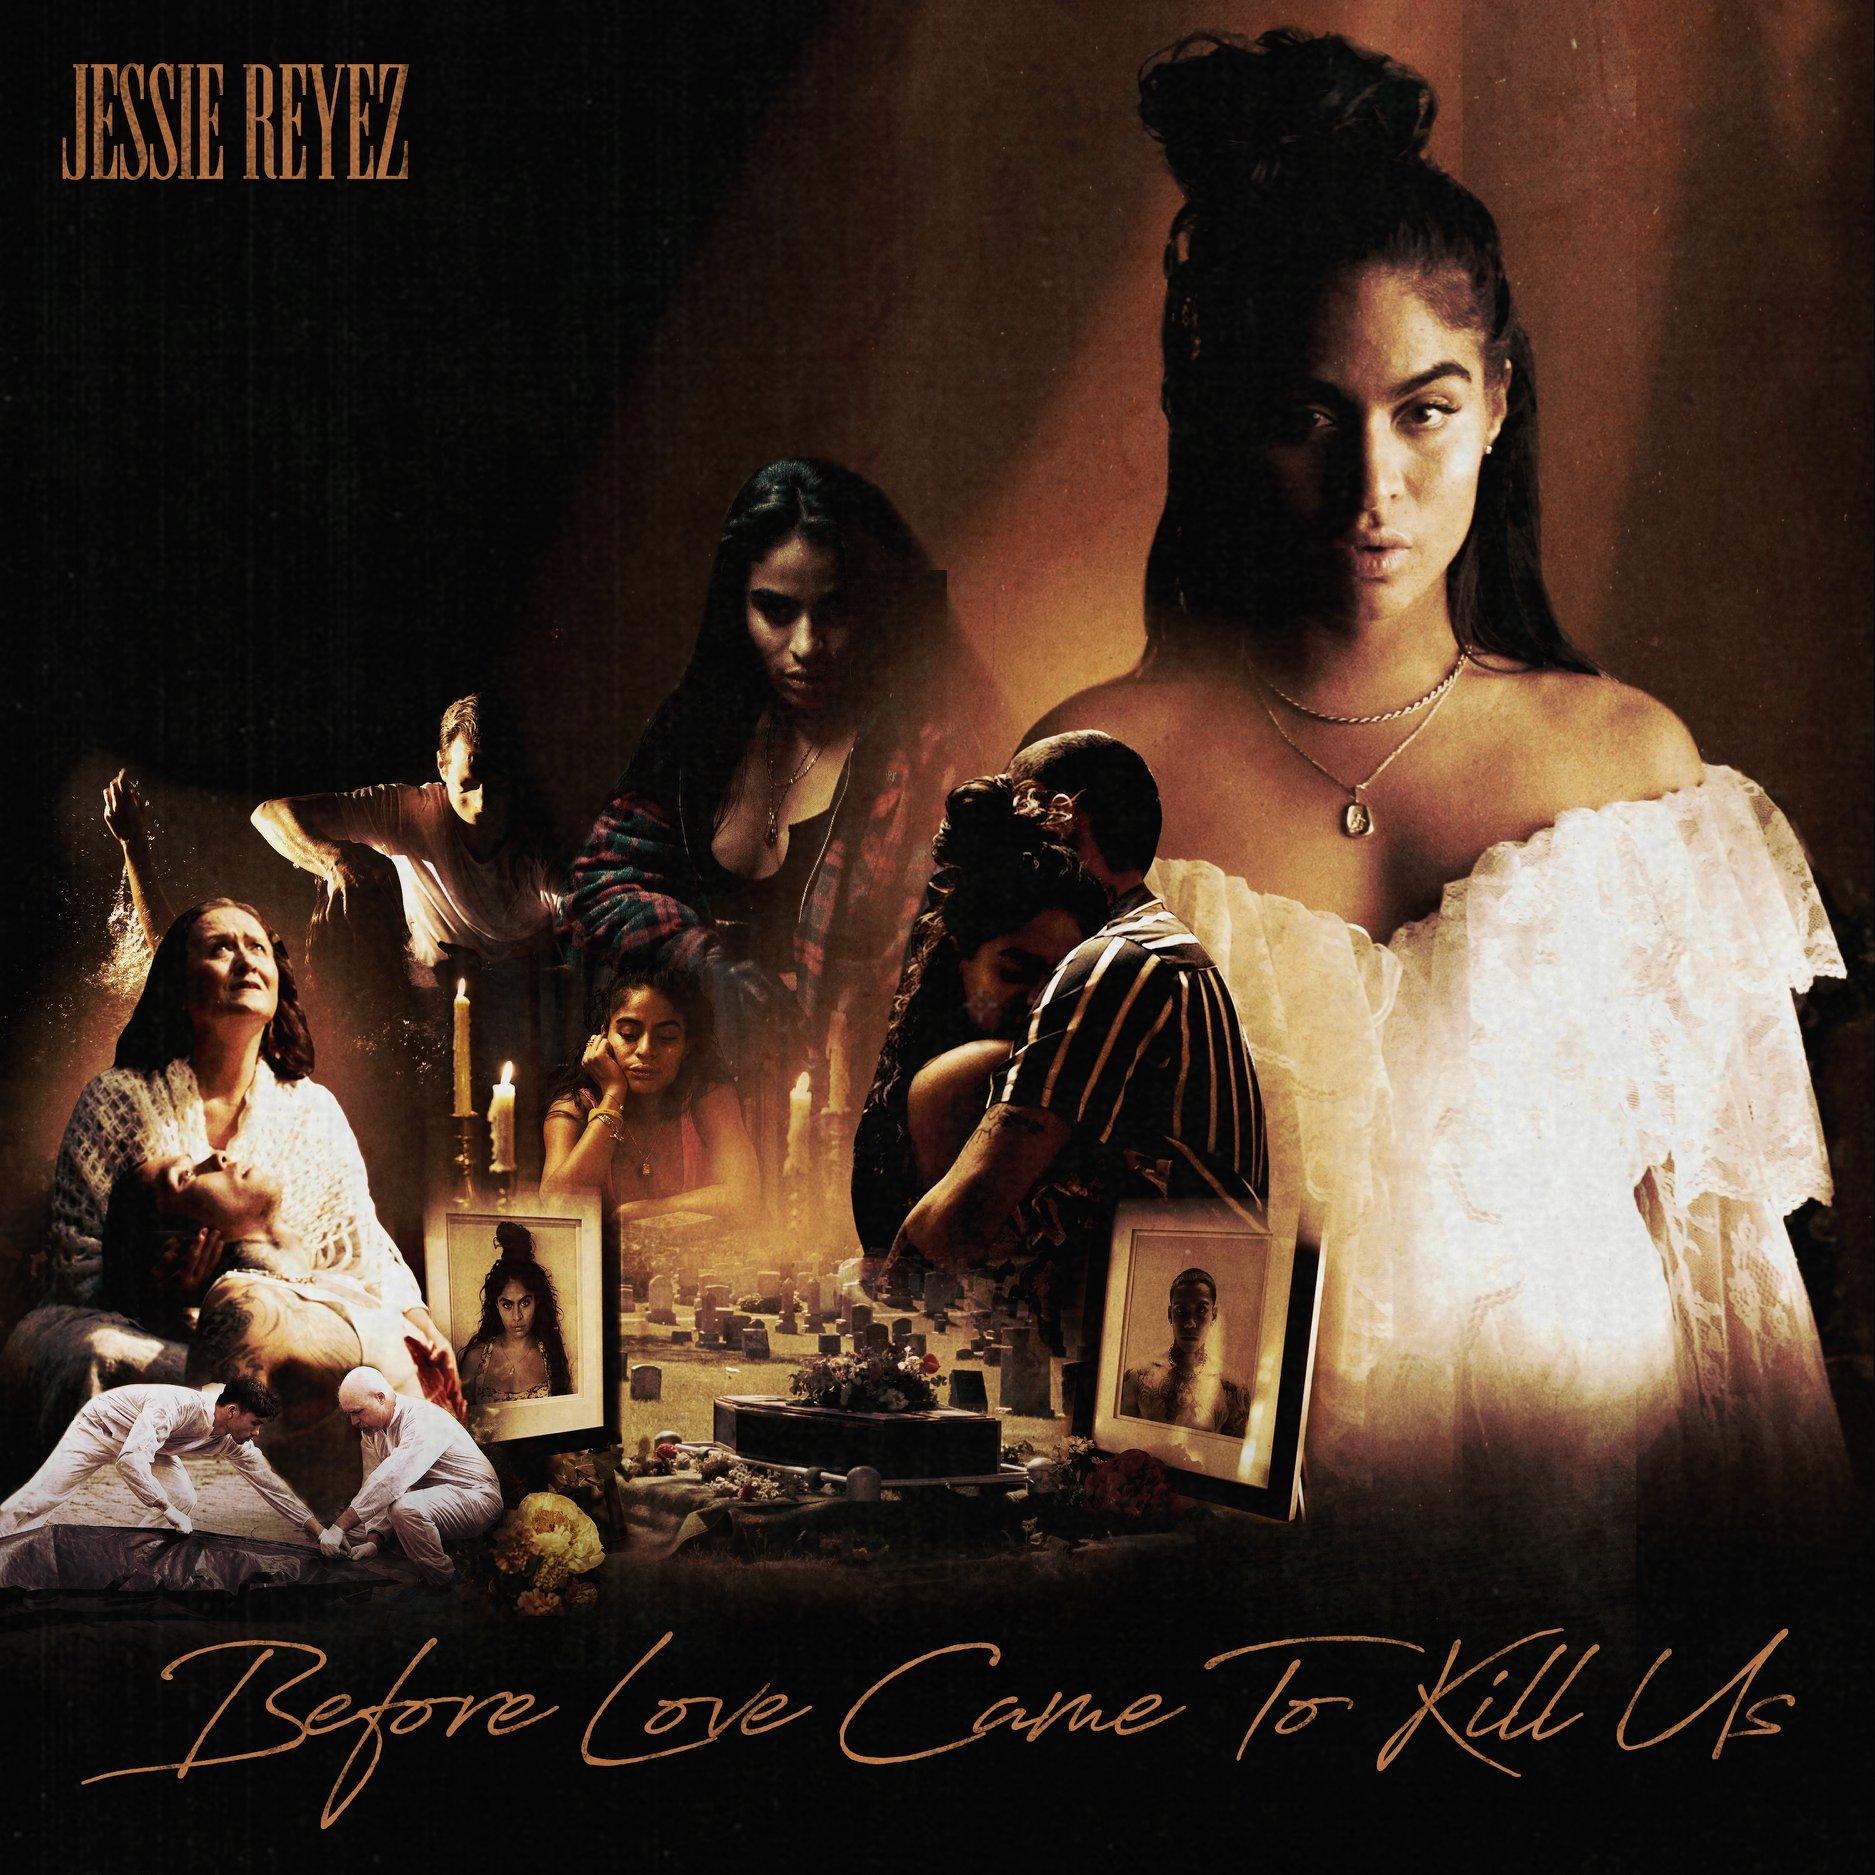 Jessie Reyez shares three original live performances